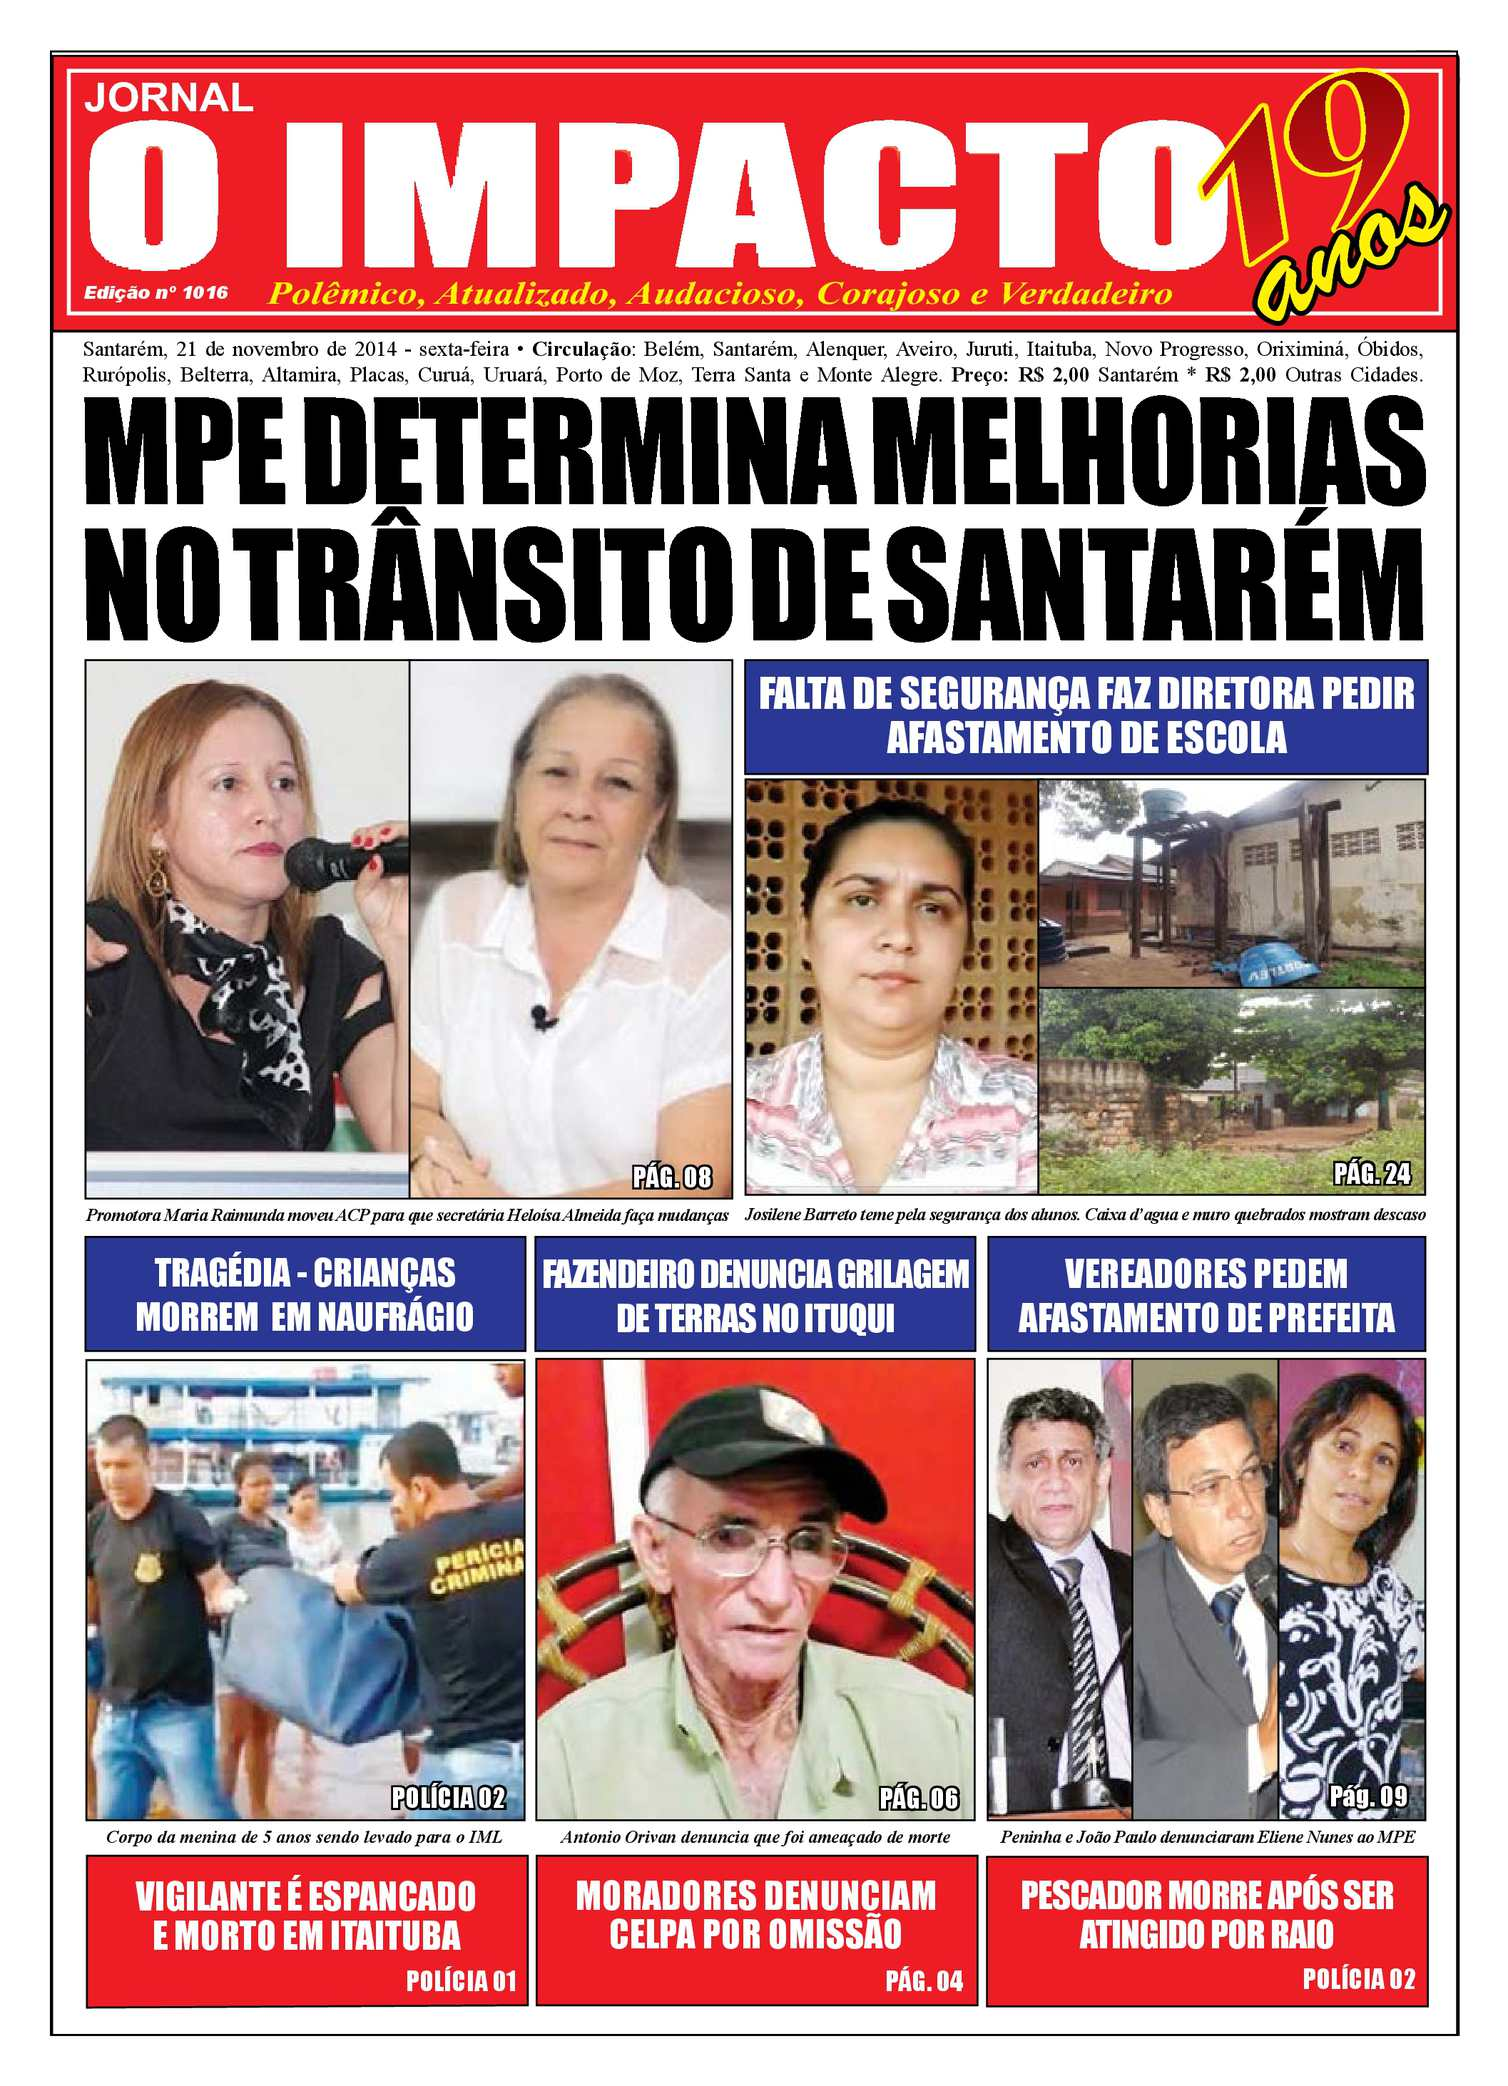 Calaméo - Jornal O Impacto Ed. 1016 5938369f44